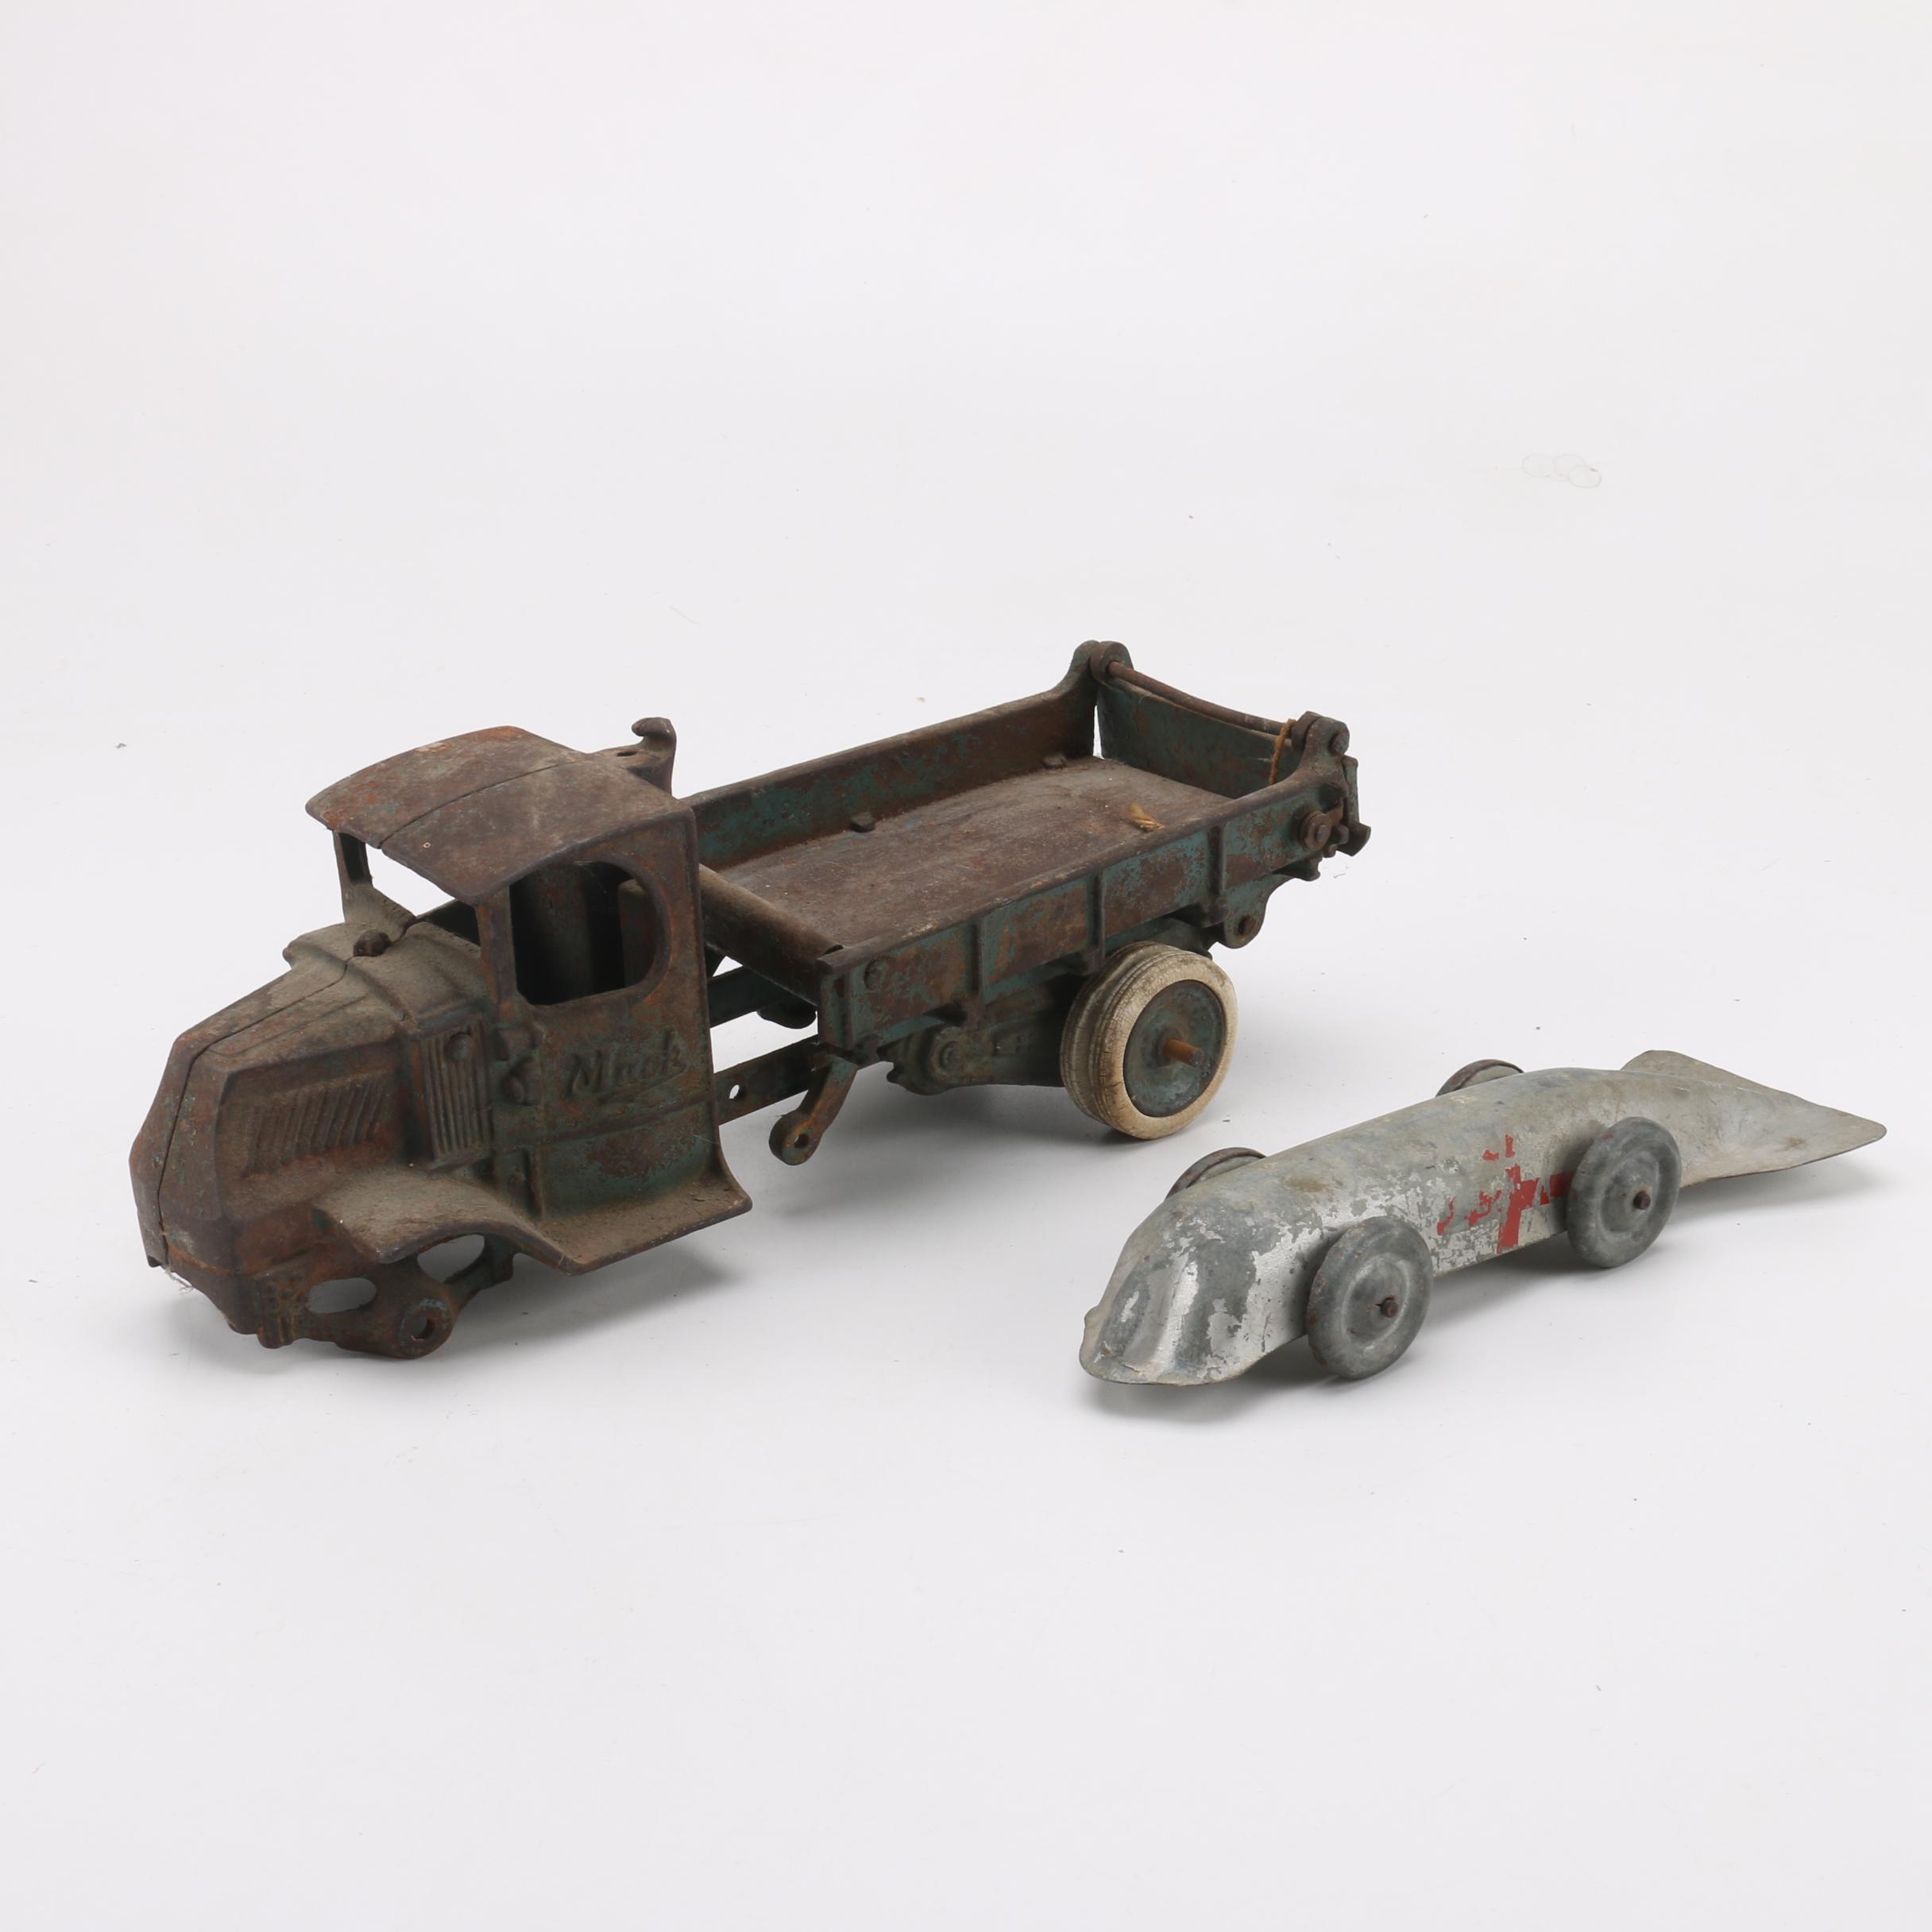 Vintage Cast Metal Toy Vehicles